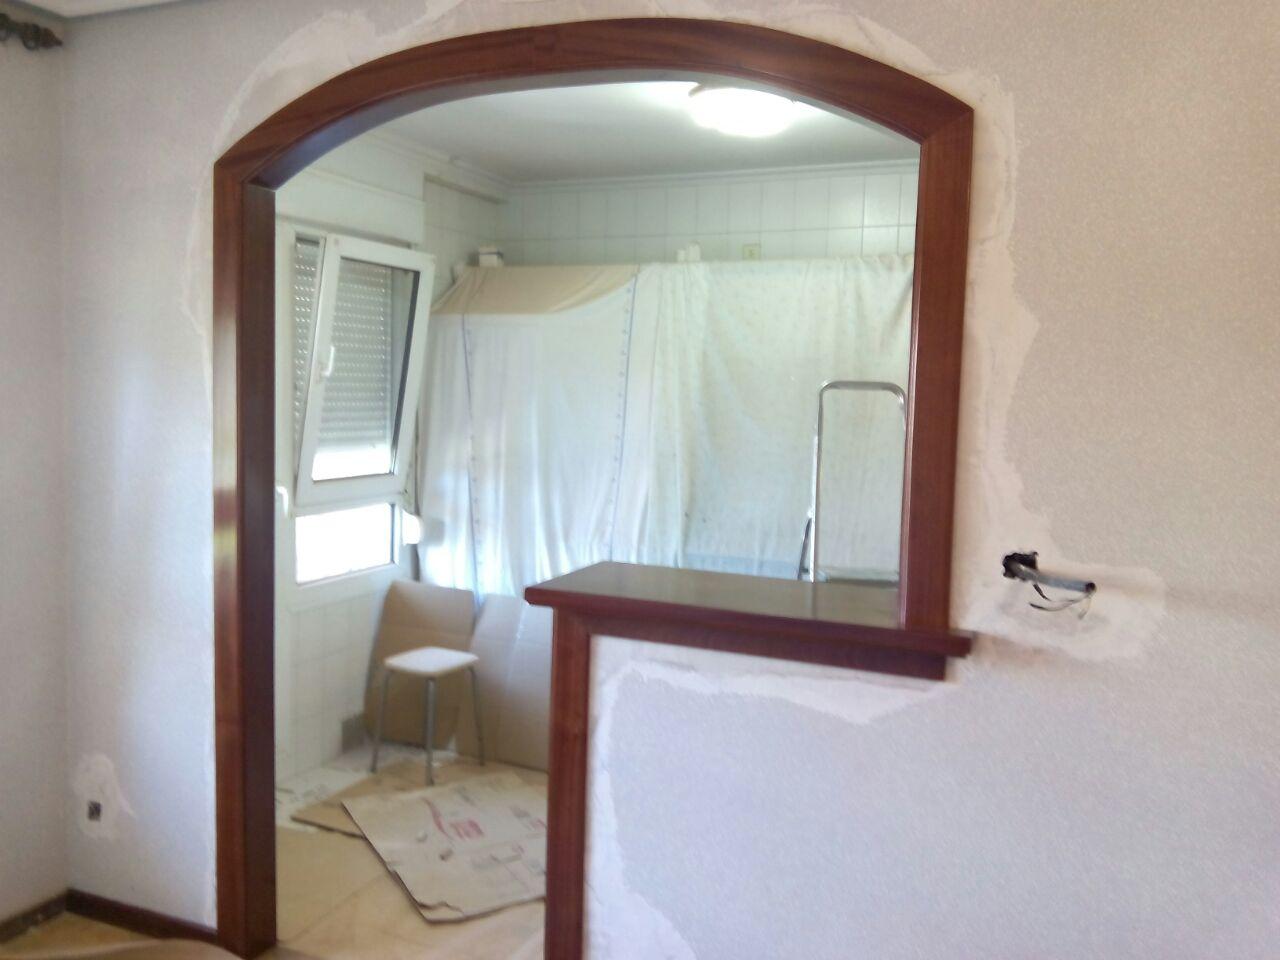 Maderas para arcos ideas de disenos for Arcos de madera para puertas